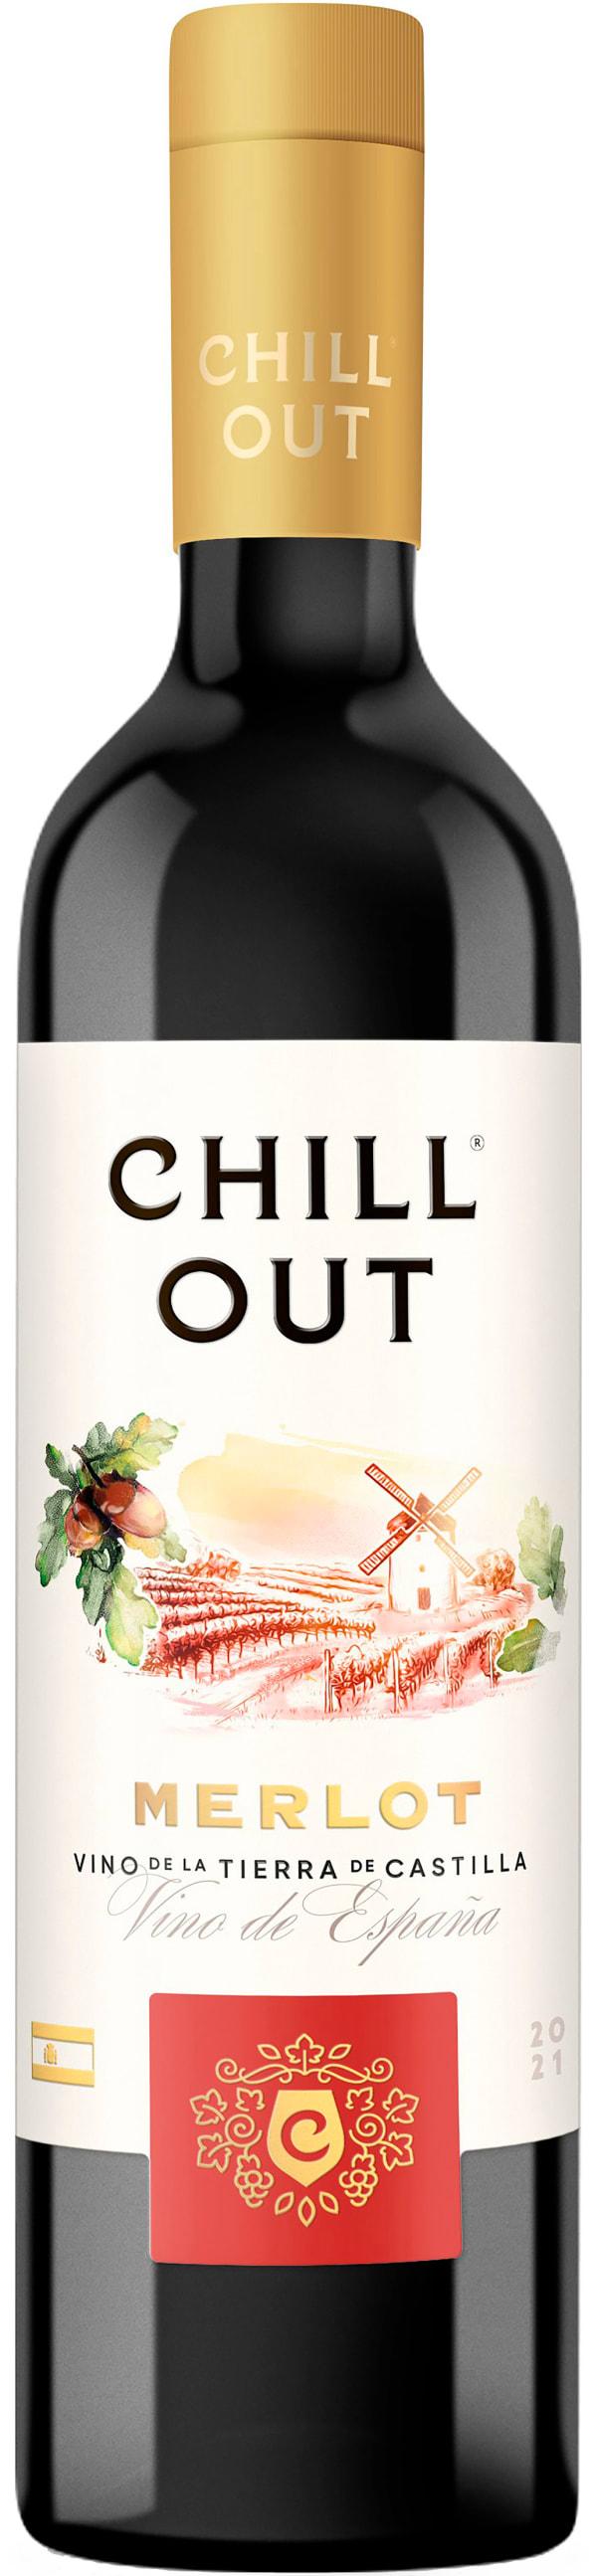 Chill Out Merlot Spain  2020 plastflaska